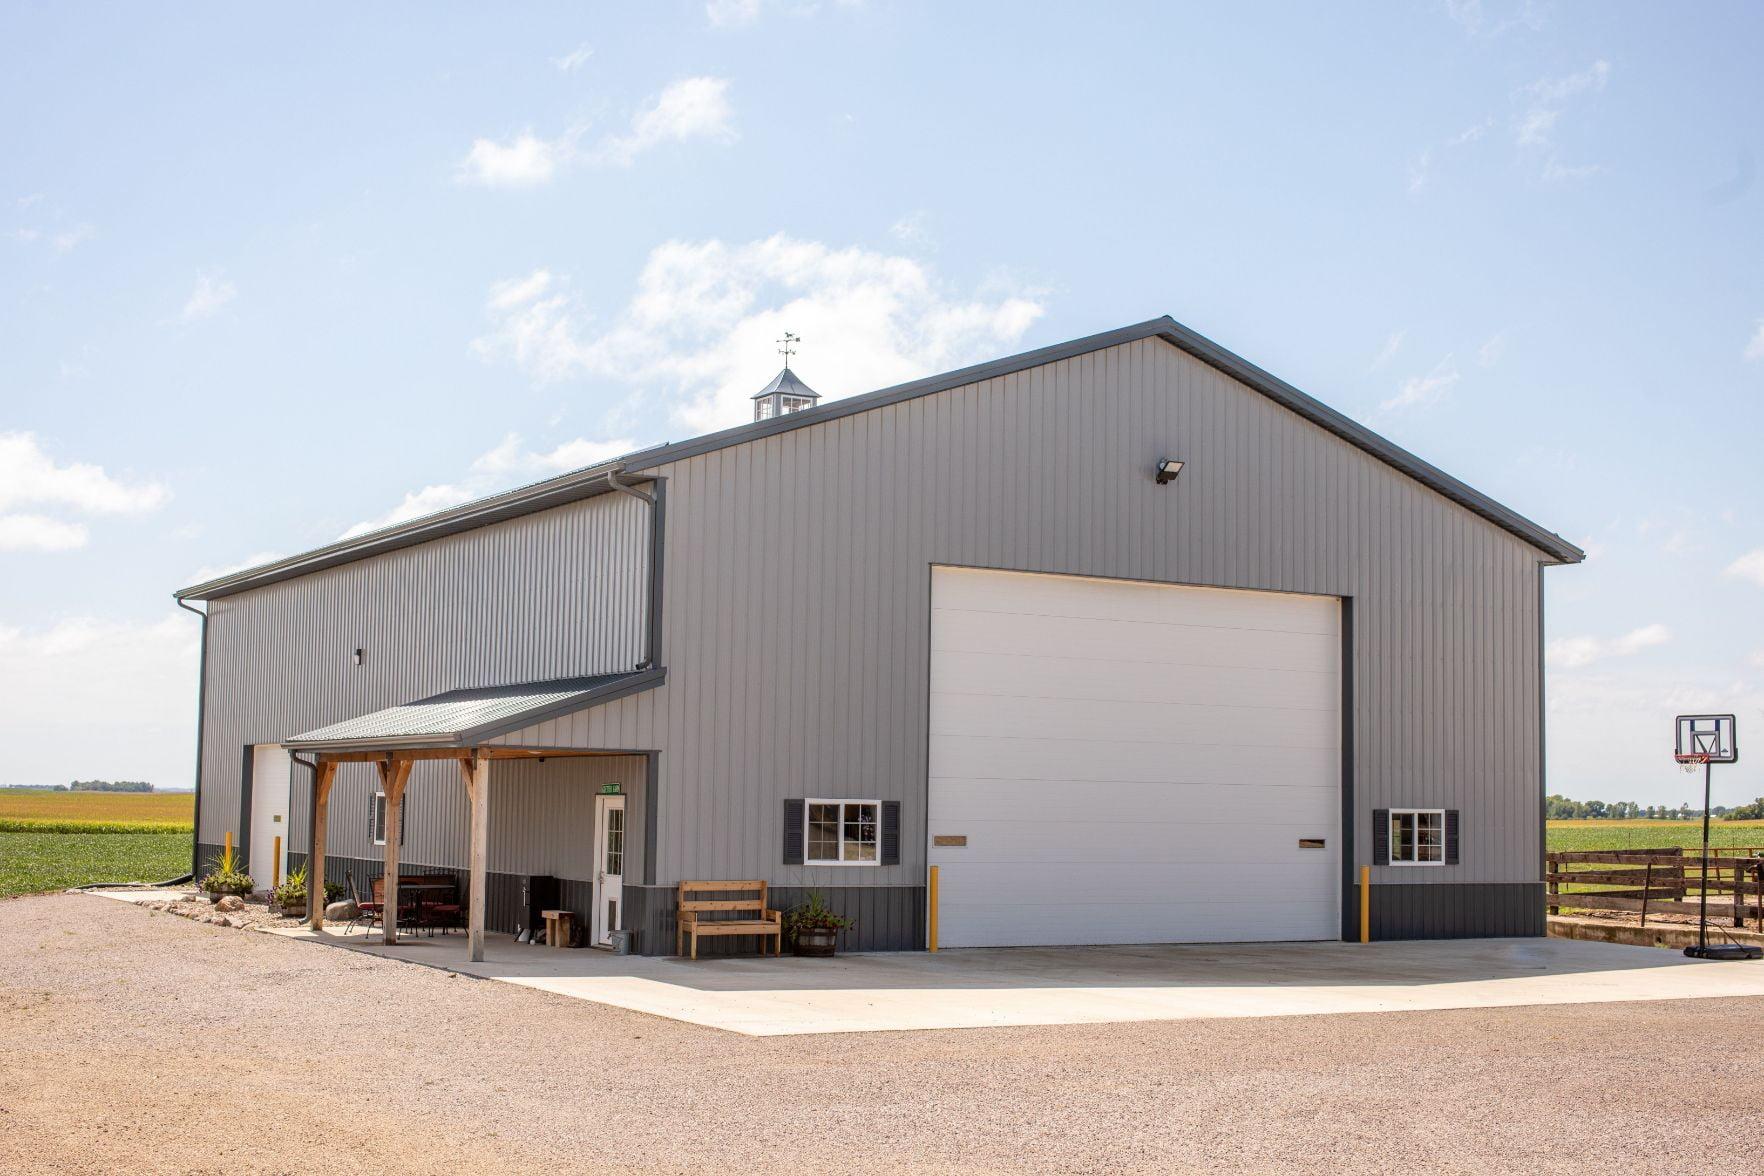 Shops & Storage Building 2